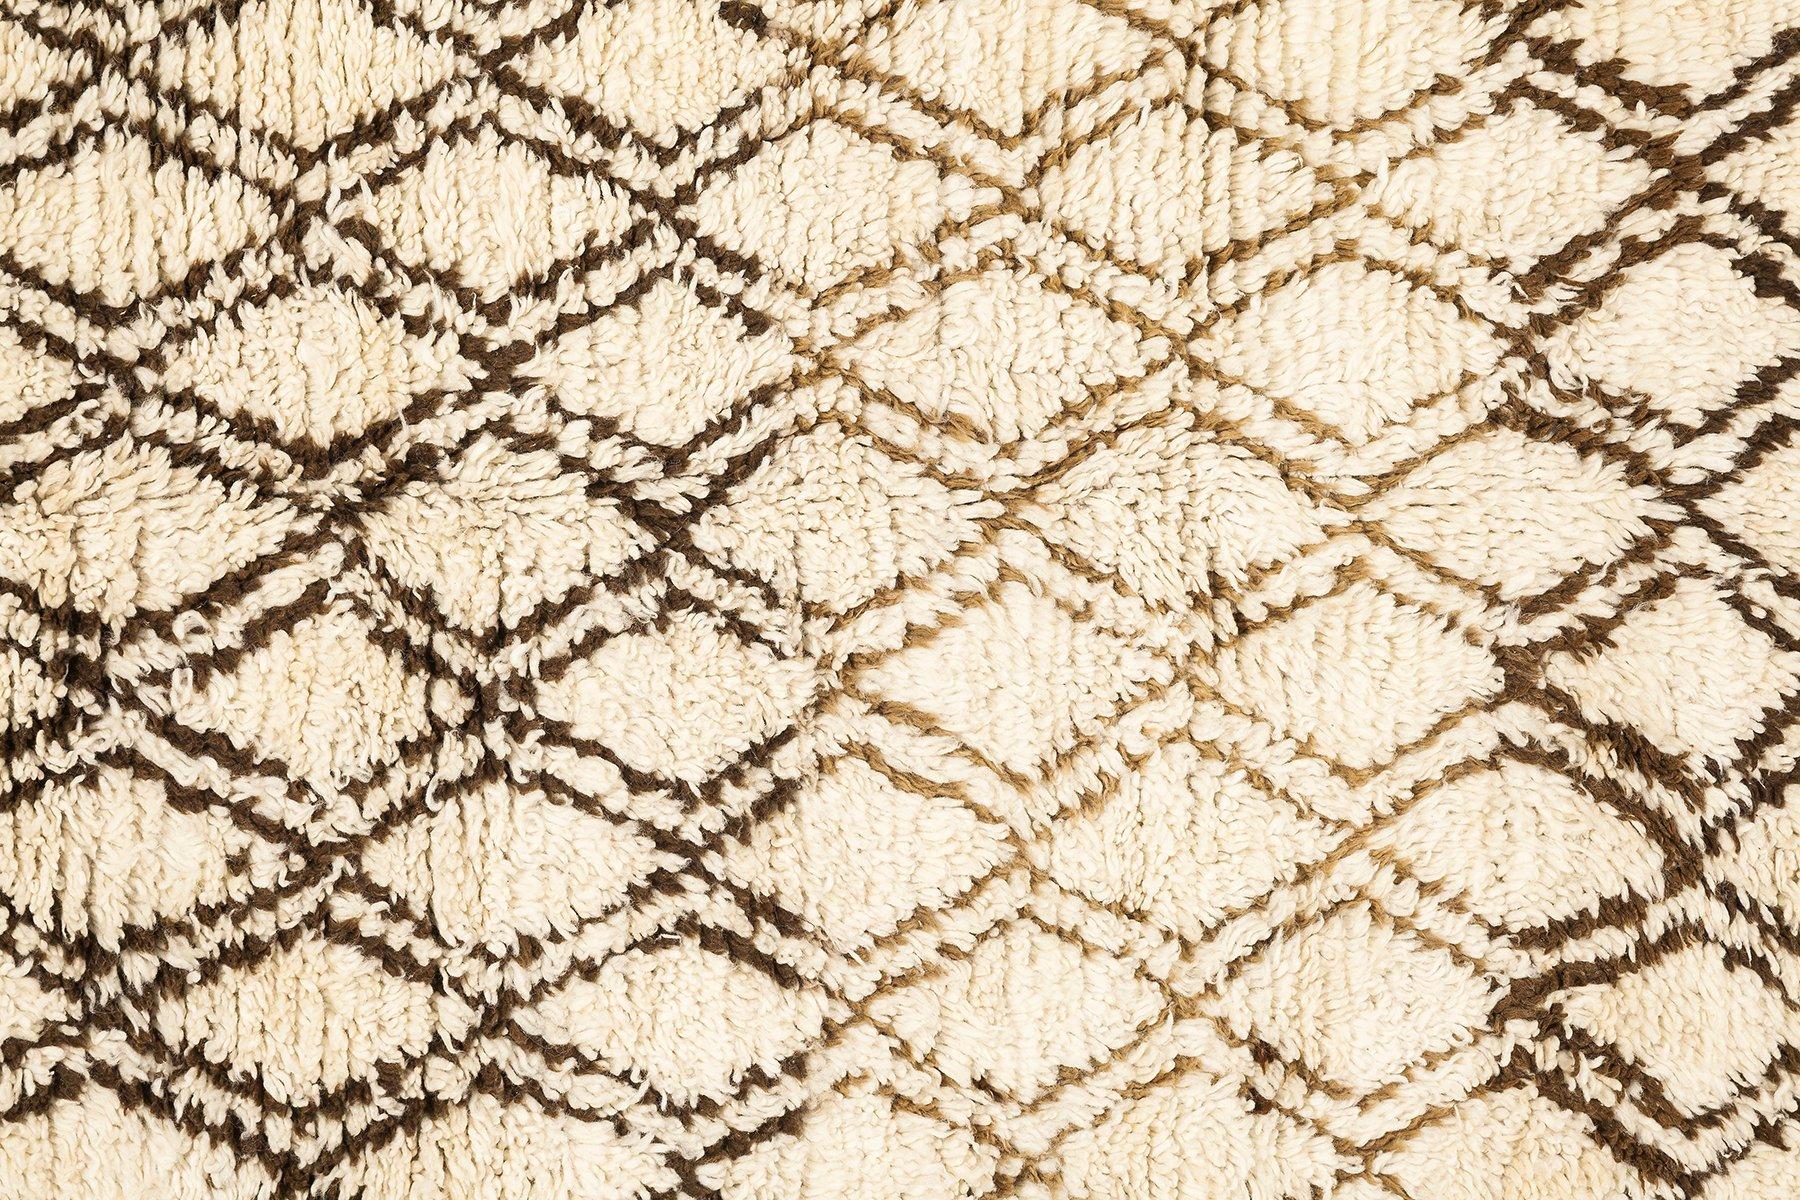 marokkanischer vintage berber teppich von talsint 1980er. Black Bedroom Furniture Sets. Home Design Ideas